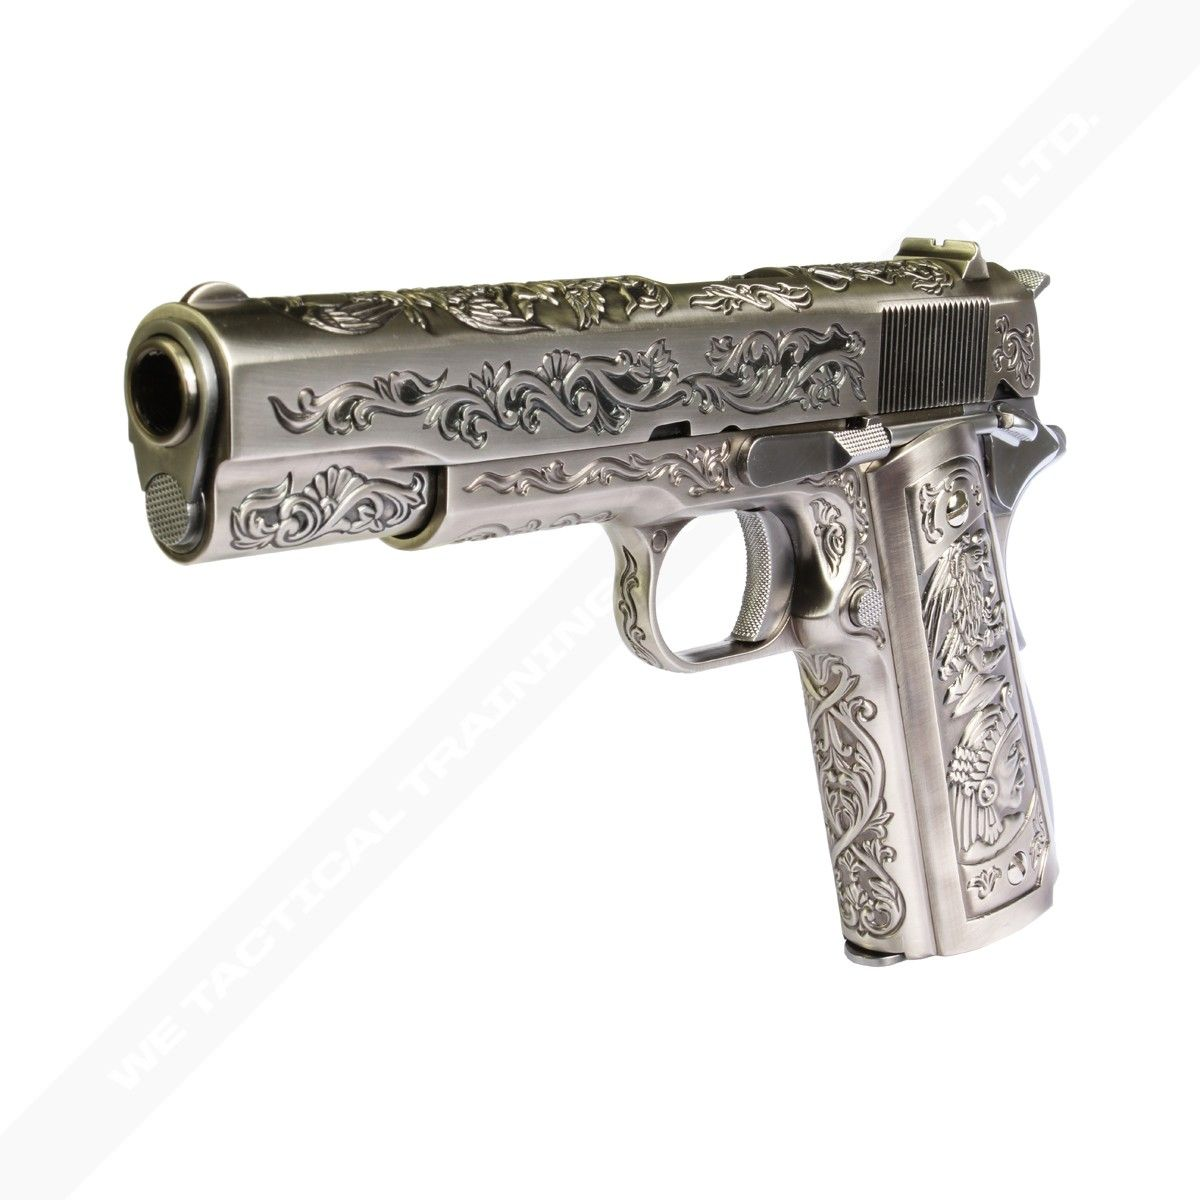 WE 1911 Custom - Engraved Model (Silver) | WE Airsoft Hong ...